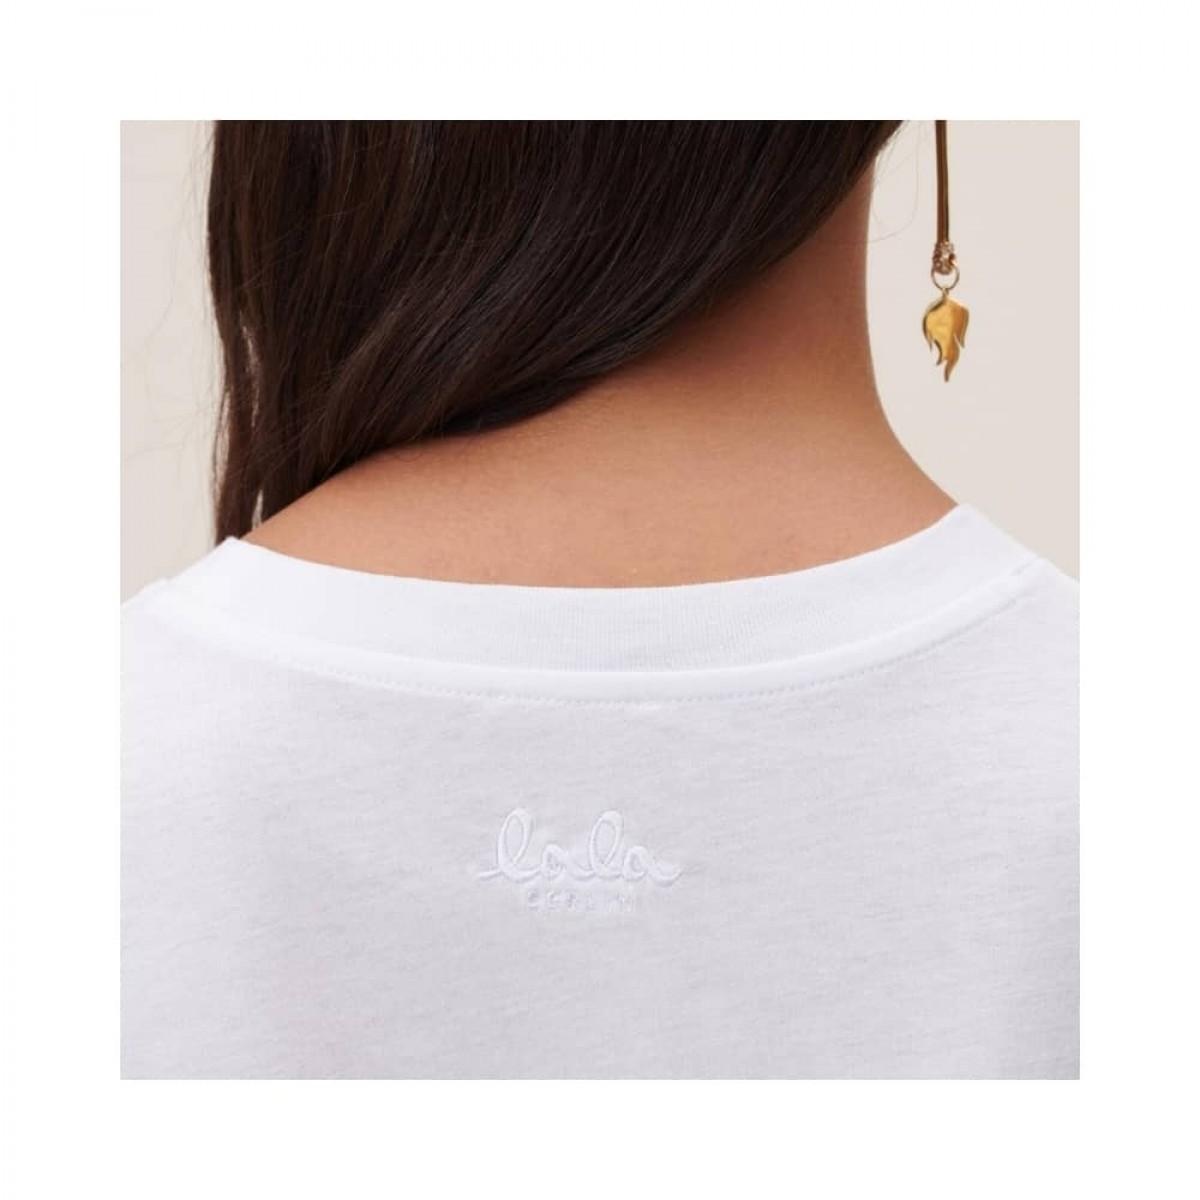 cara heart t-shirt - white - model logo ryg